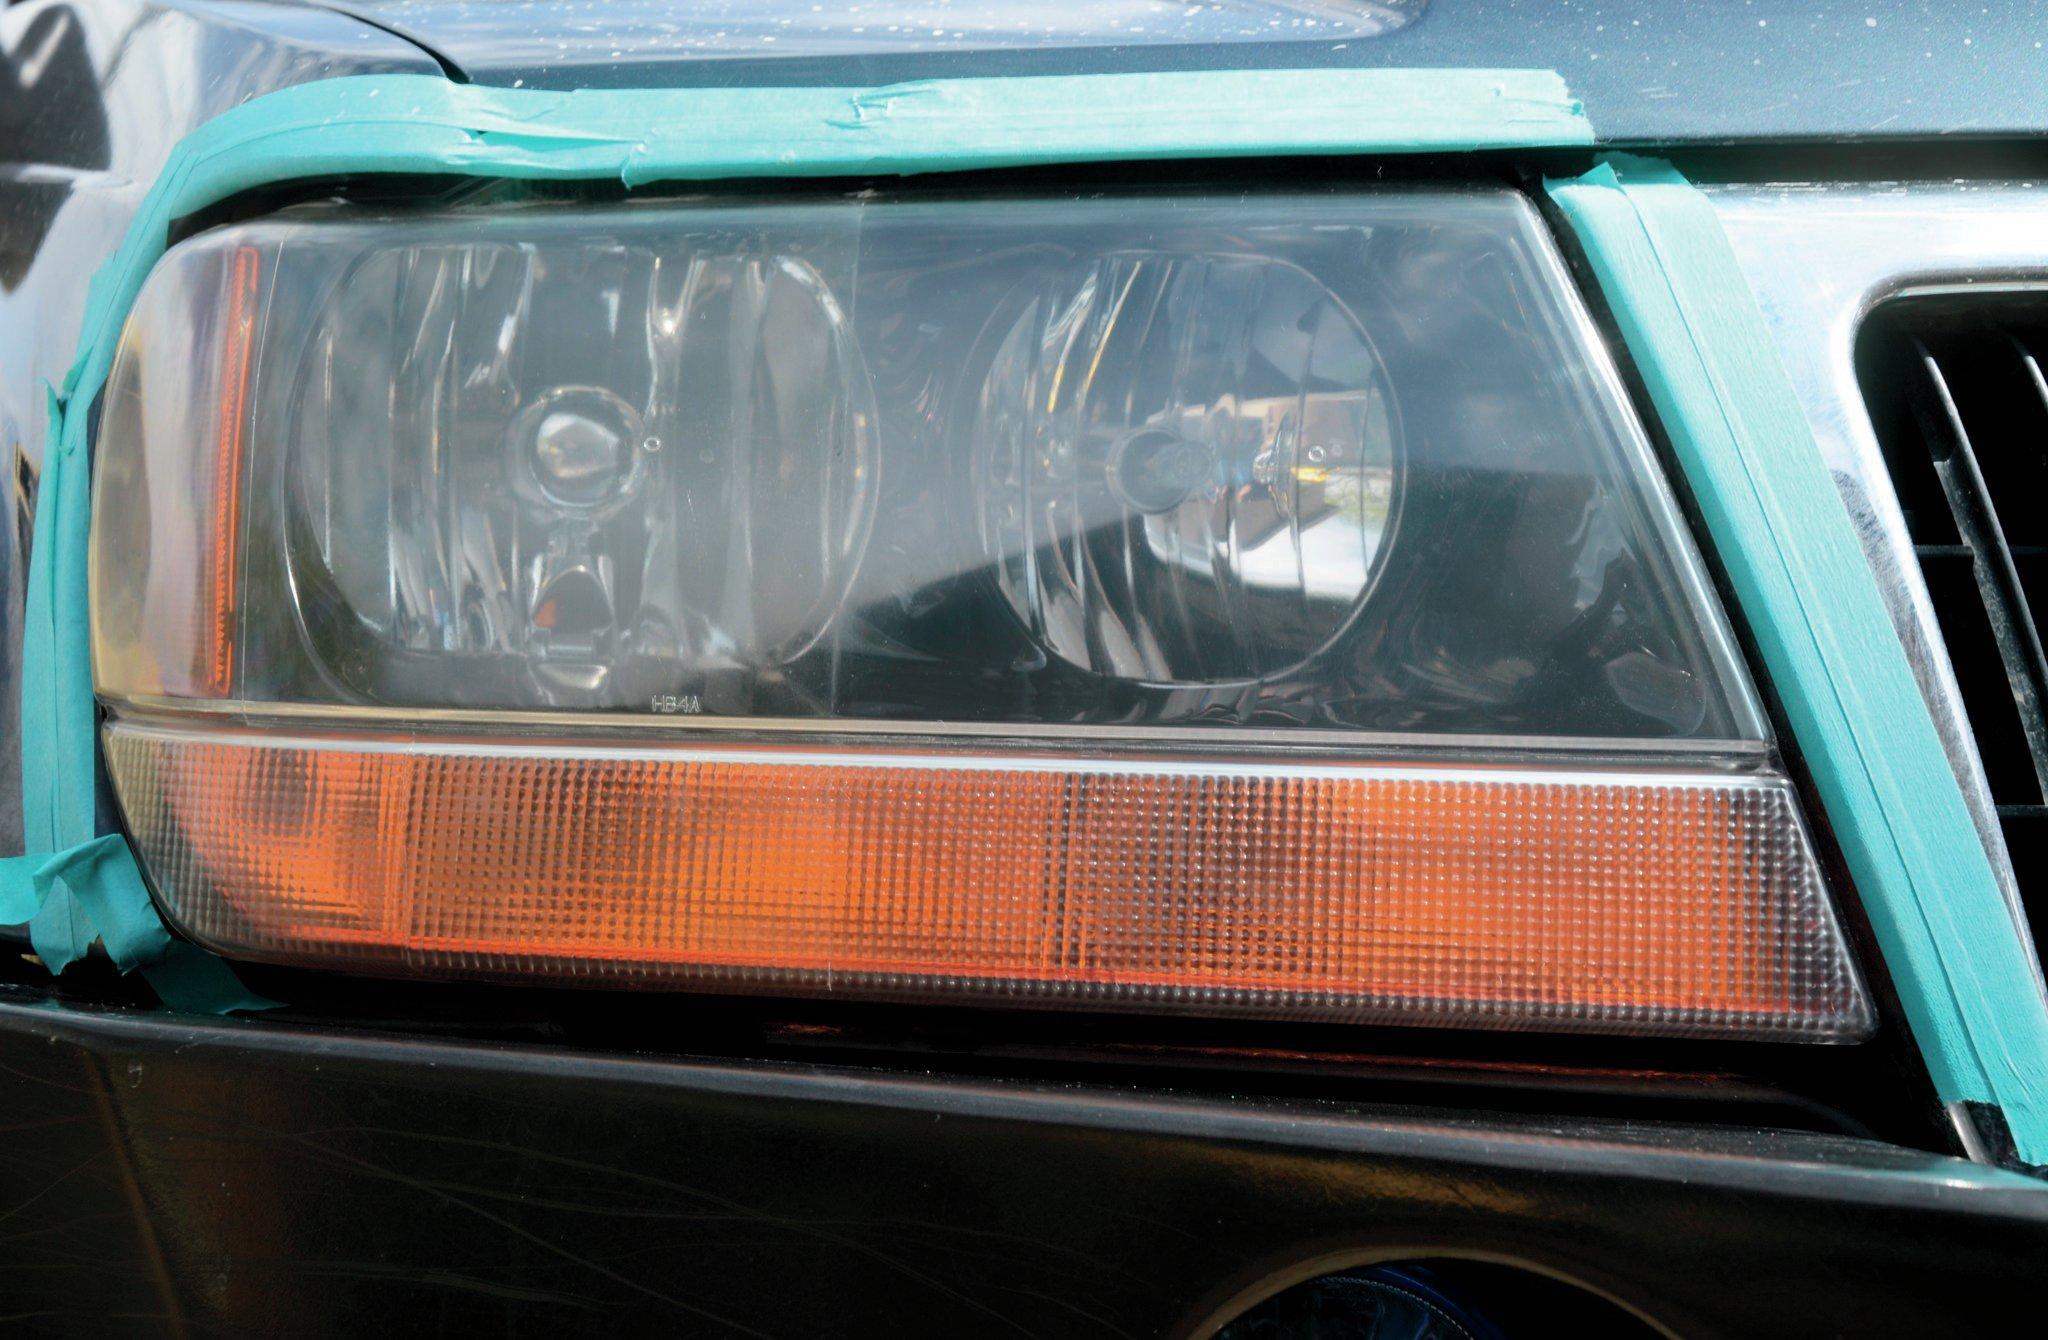 2001 Jeep Grand Cherokee WJ headlight 005